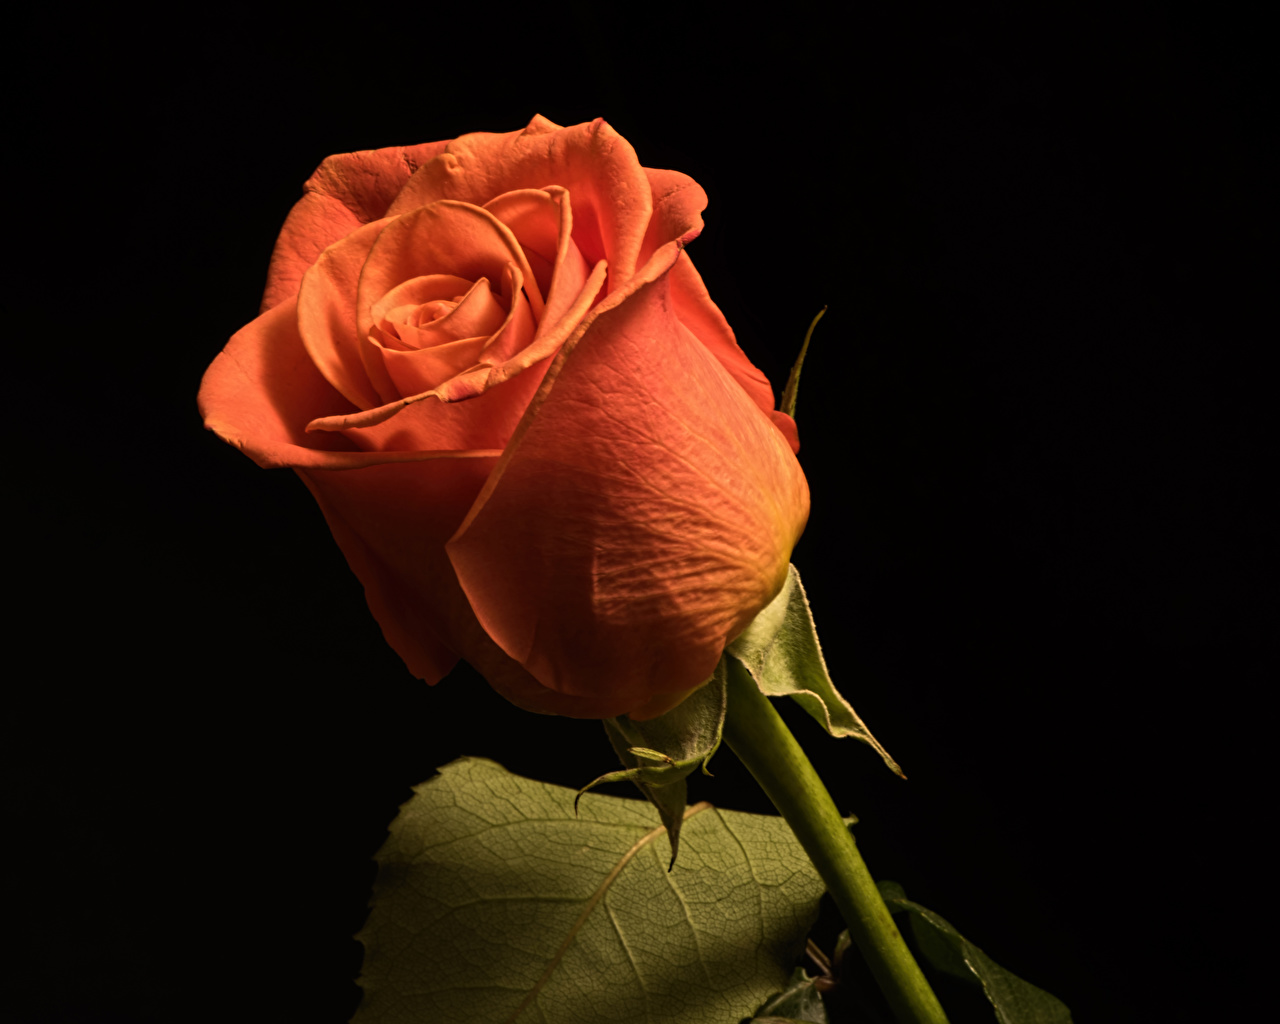 Foto ros Orange blomma Närbild Svart bakgrund Rosor Blommor